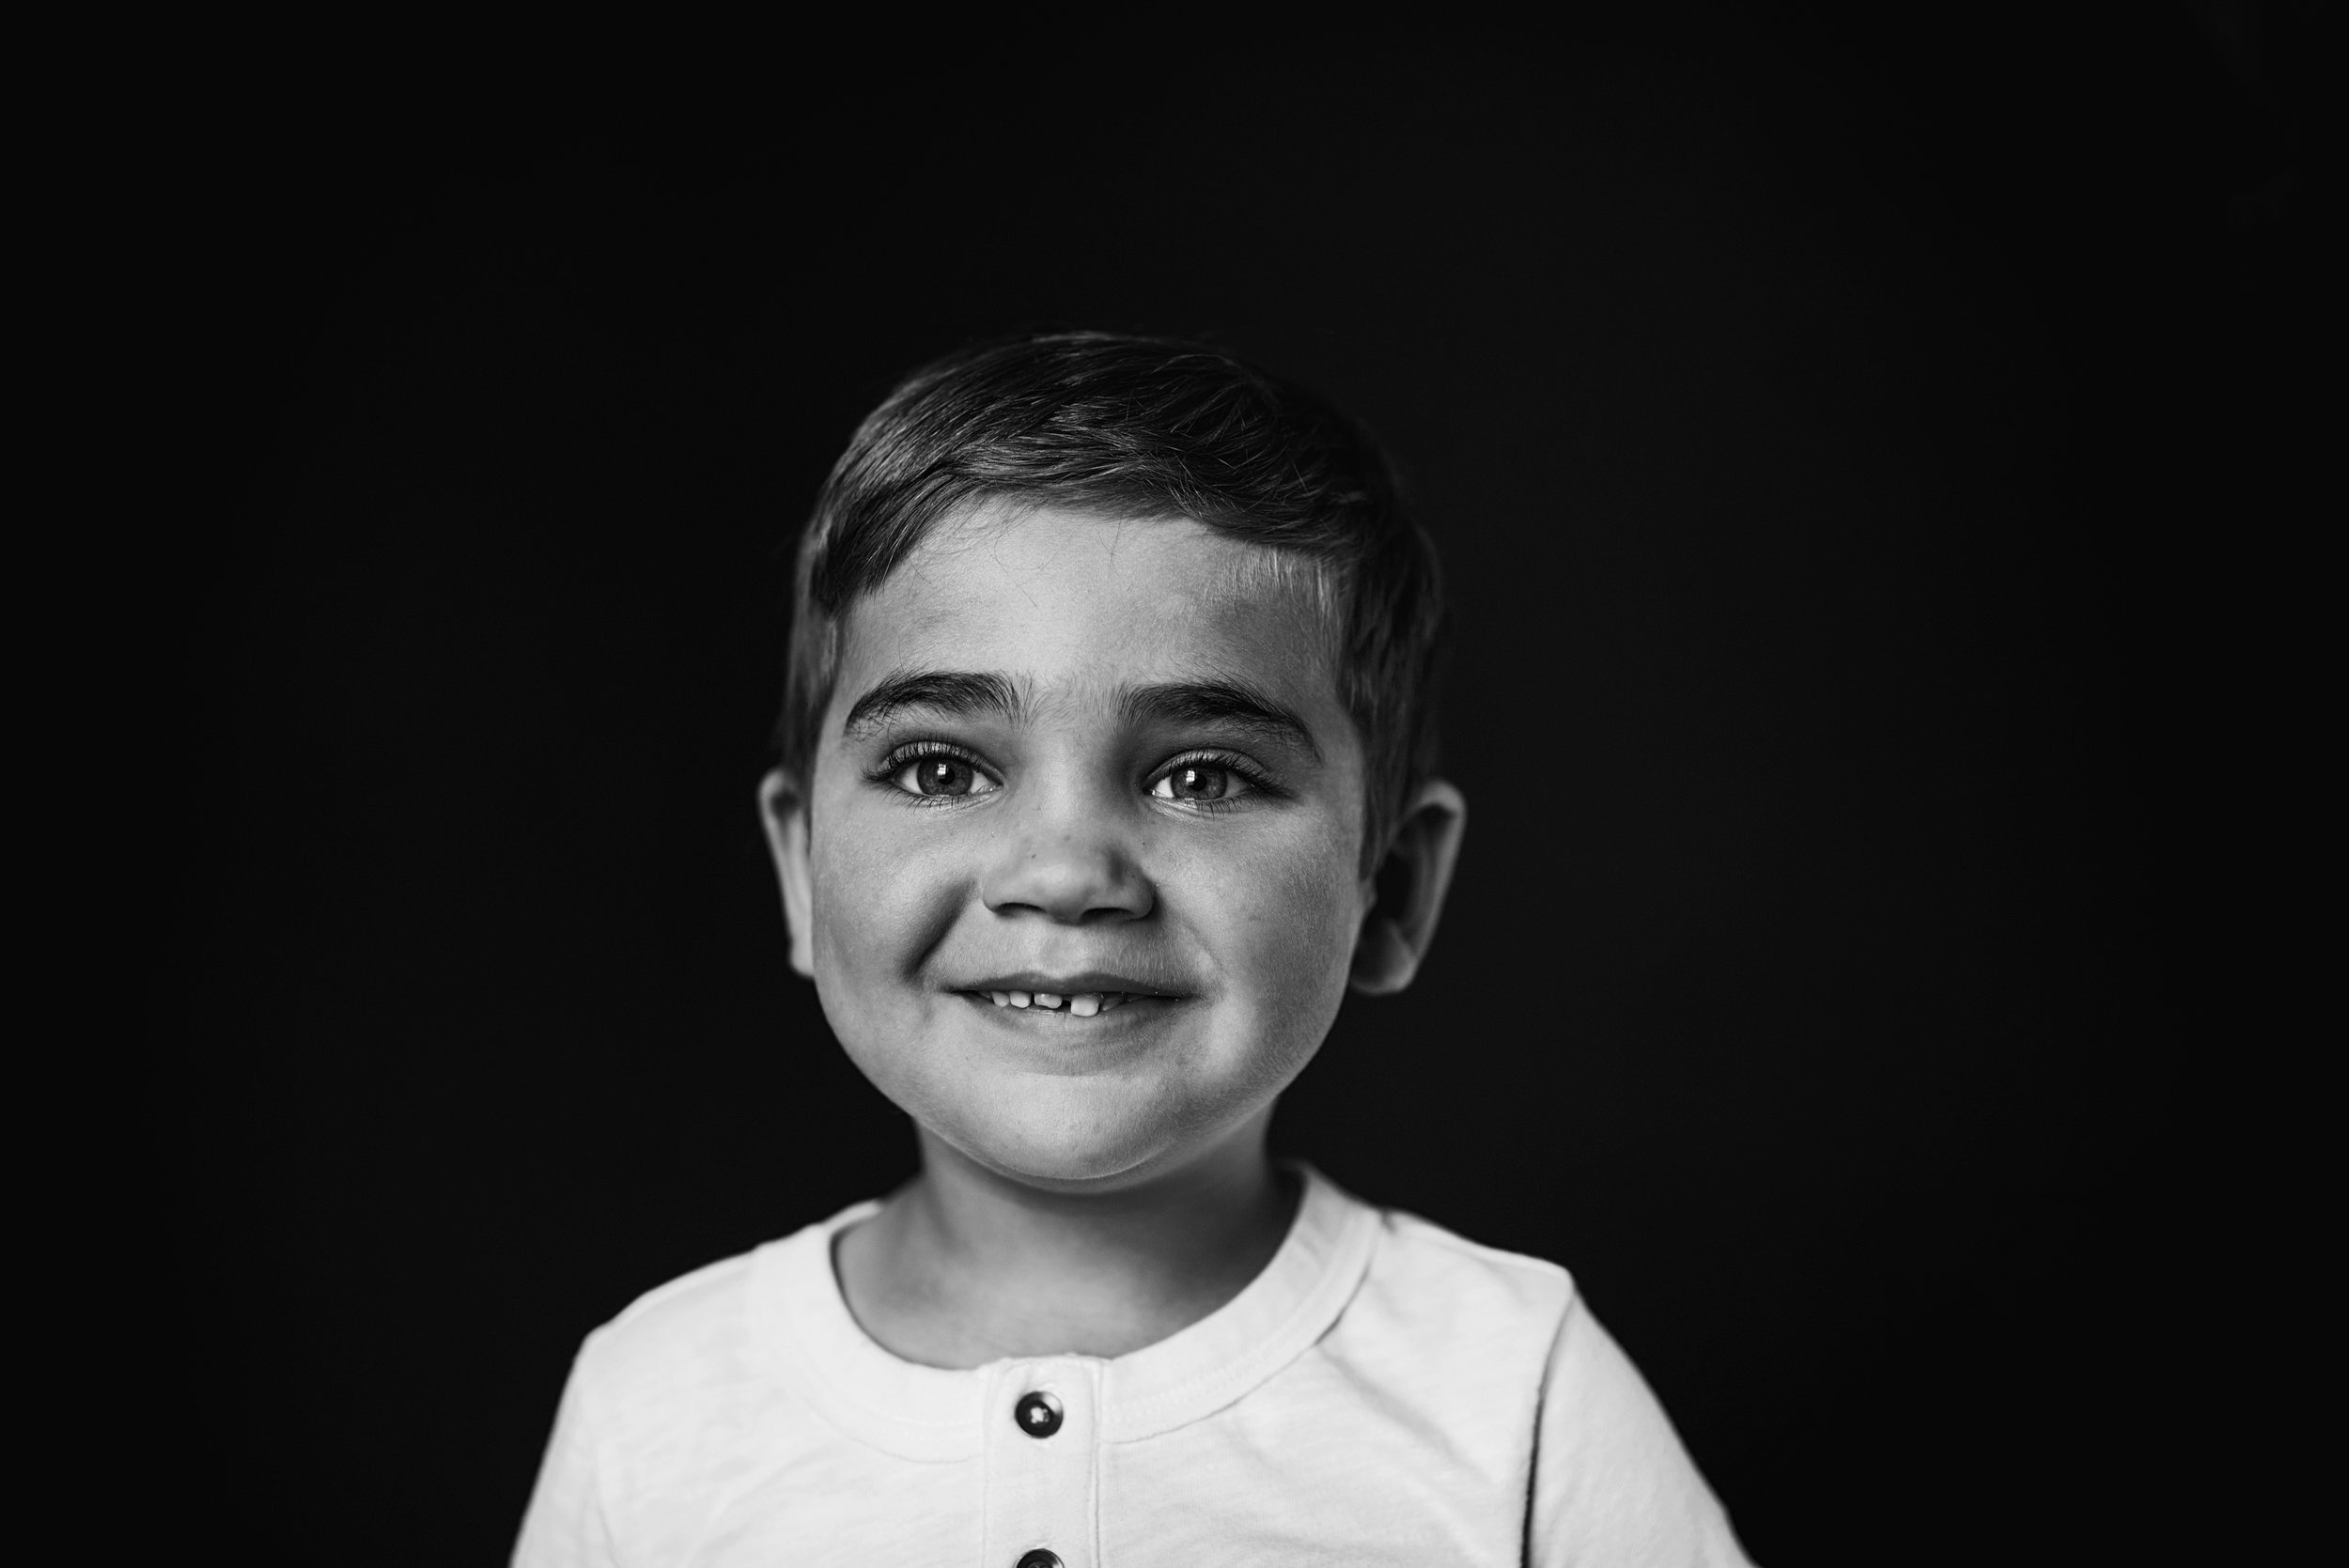 Preschool portrait photographer creates one of a kind images of students serving Richmond, Midlothian, Short Pump, Glenn Allen, and Mechanicsville schools.